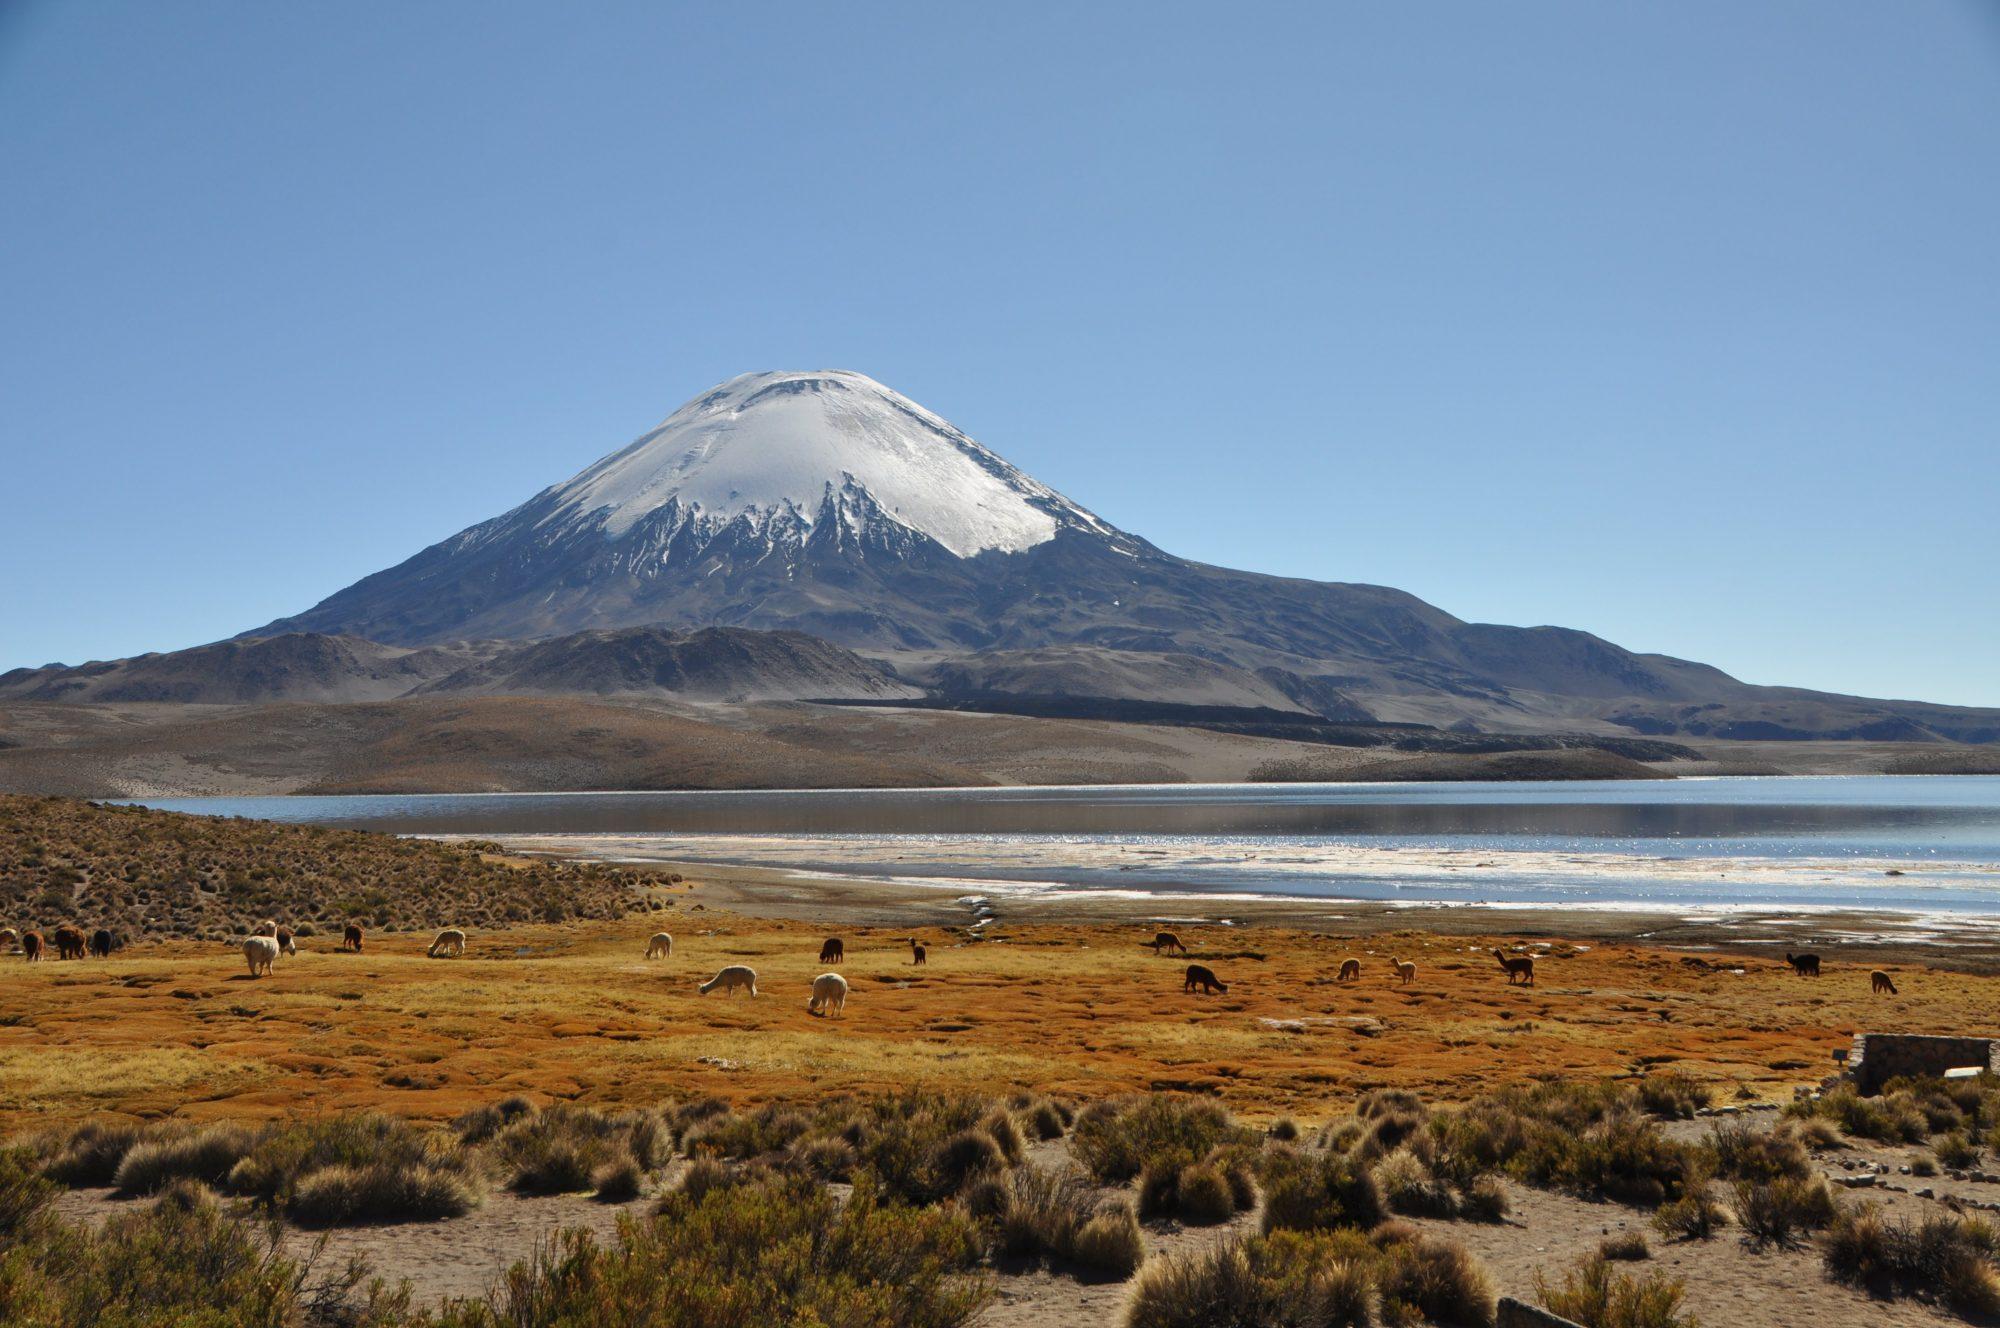 Chile Parinacota volcano